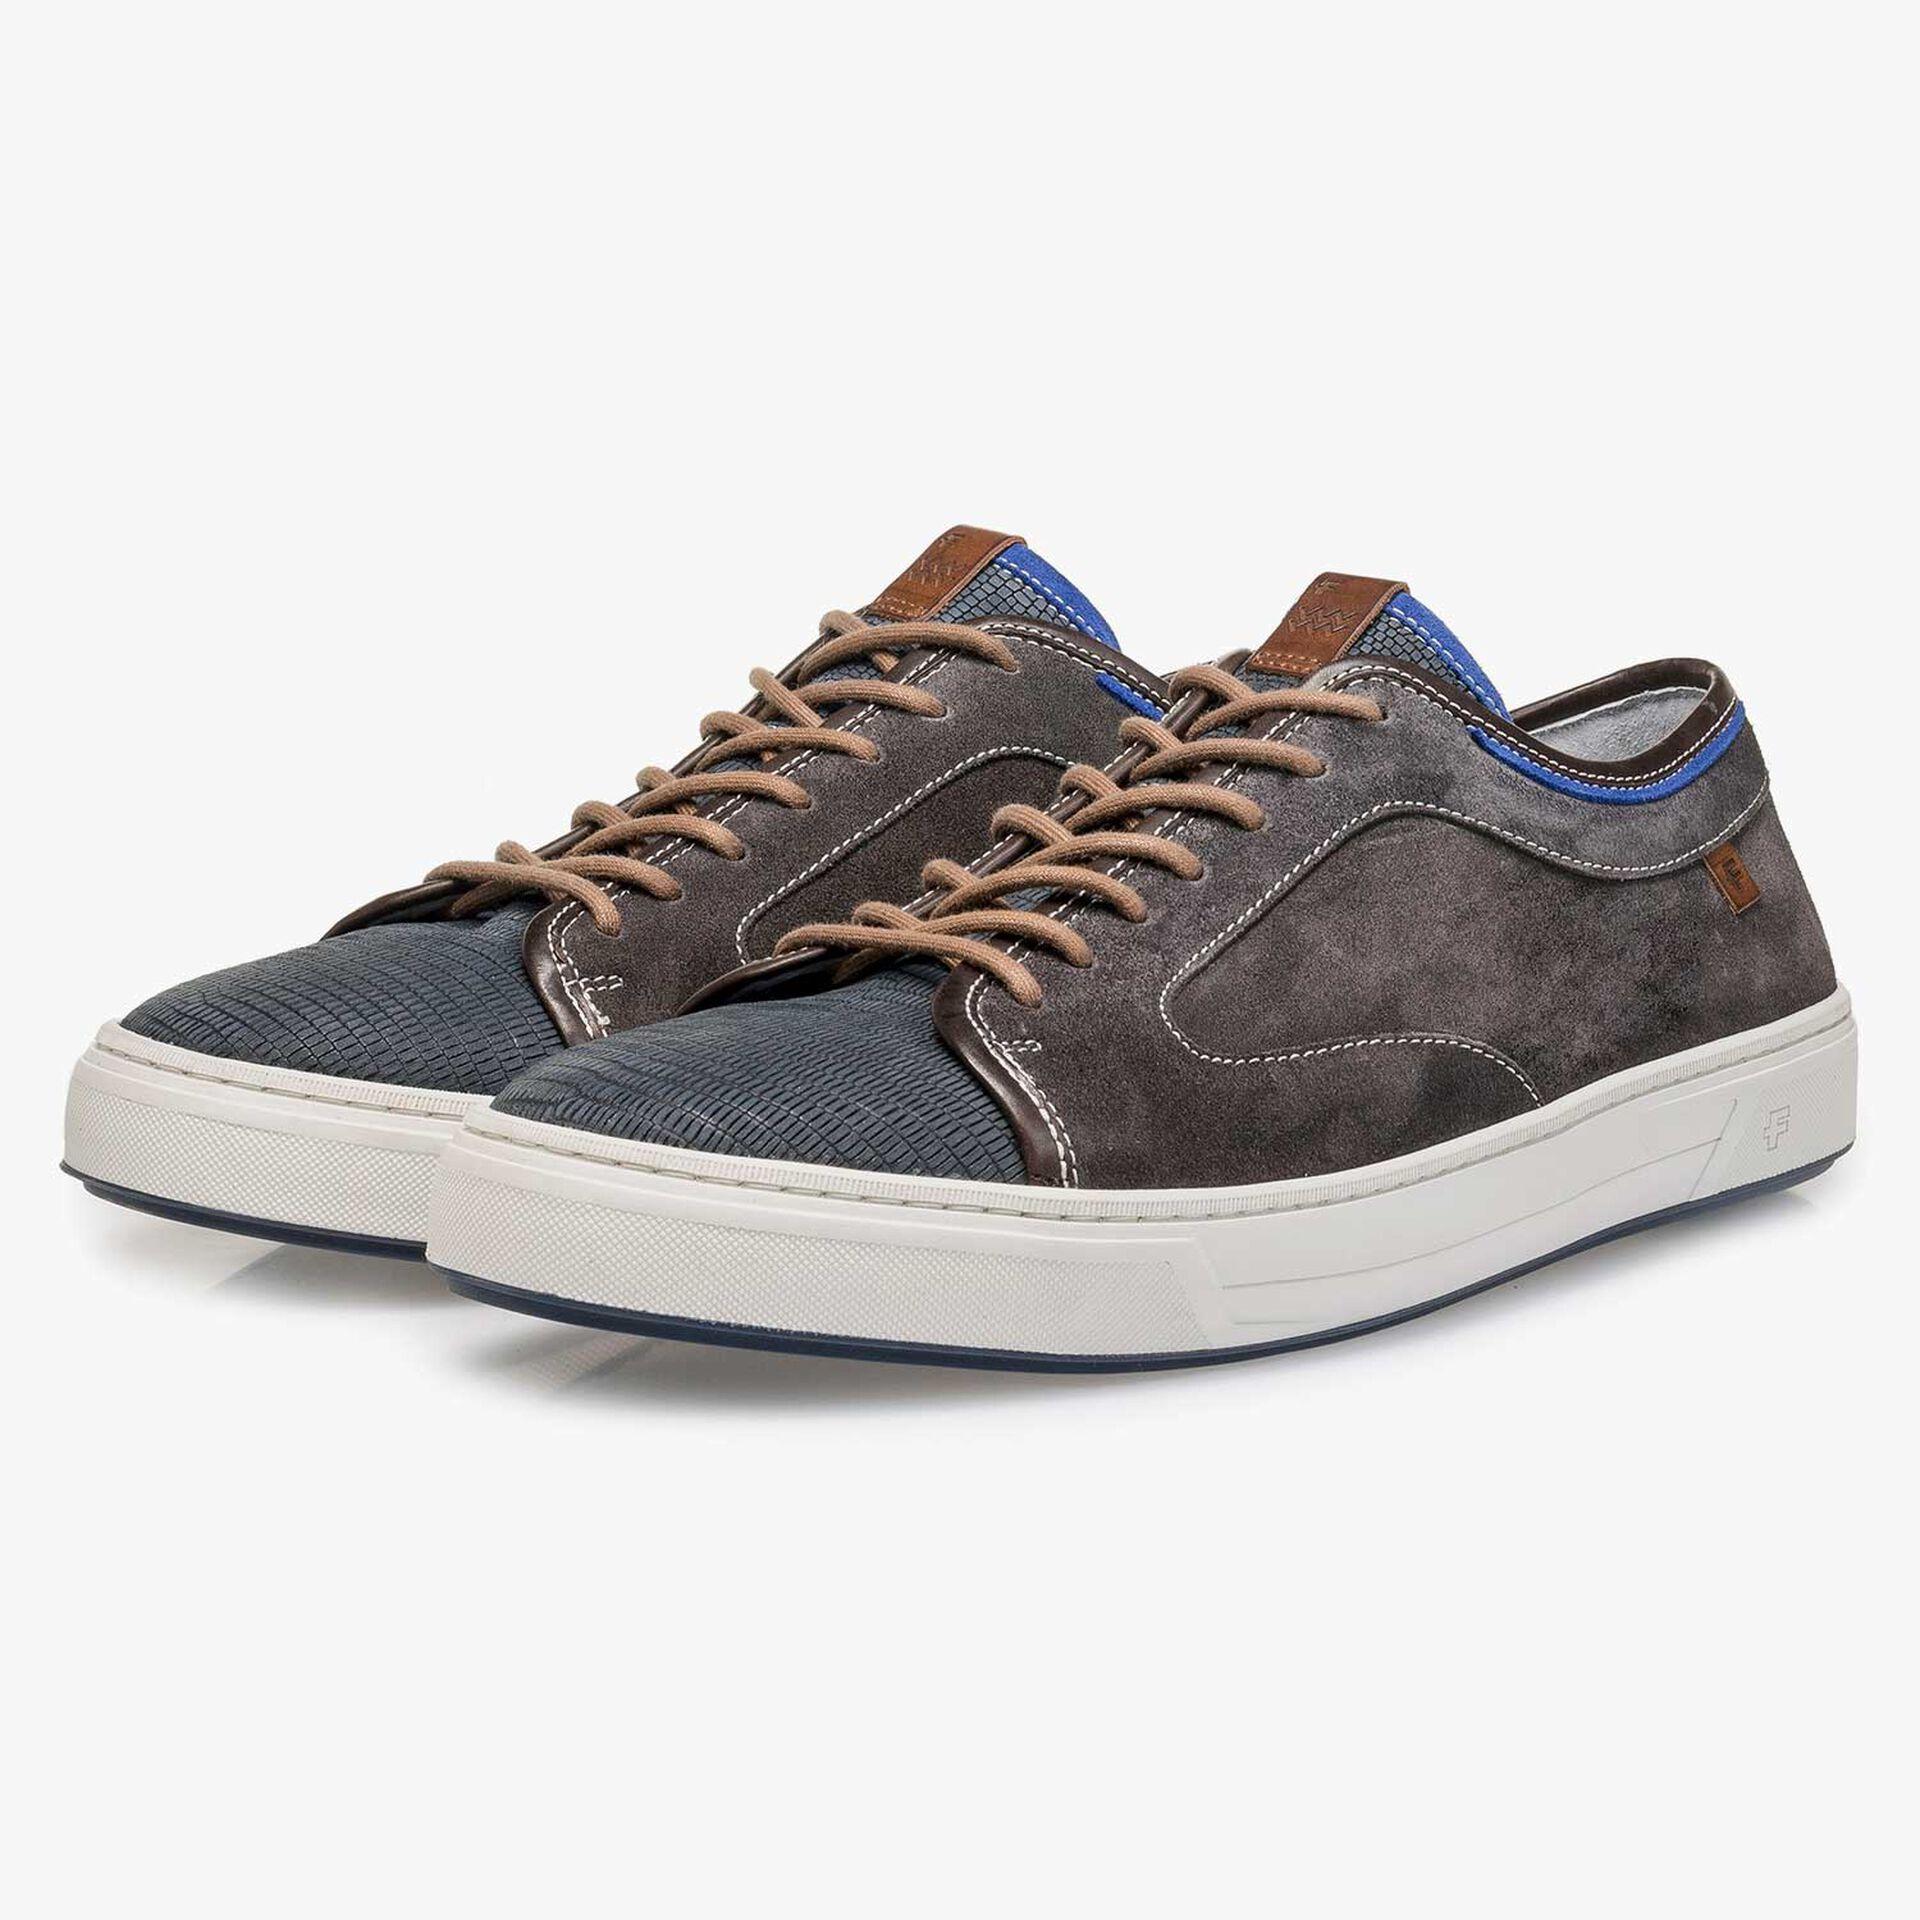 Dark grey calf suede leather sneaker with a lizard print